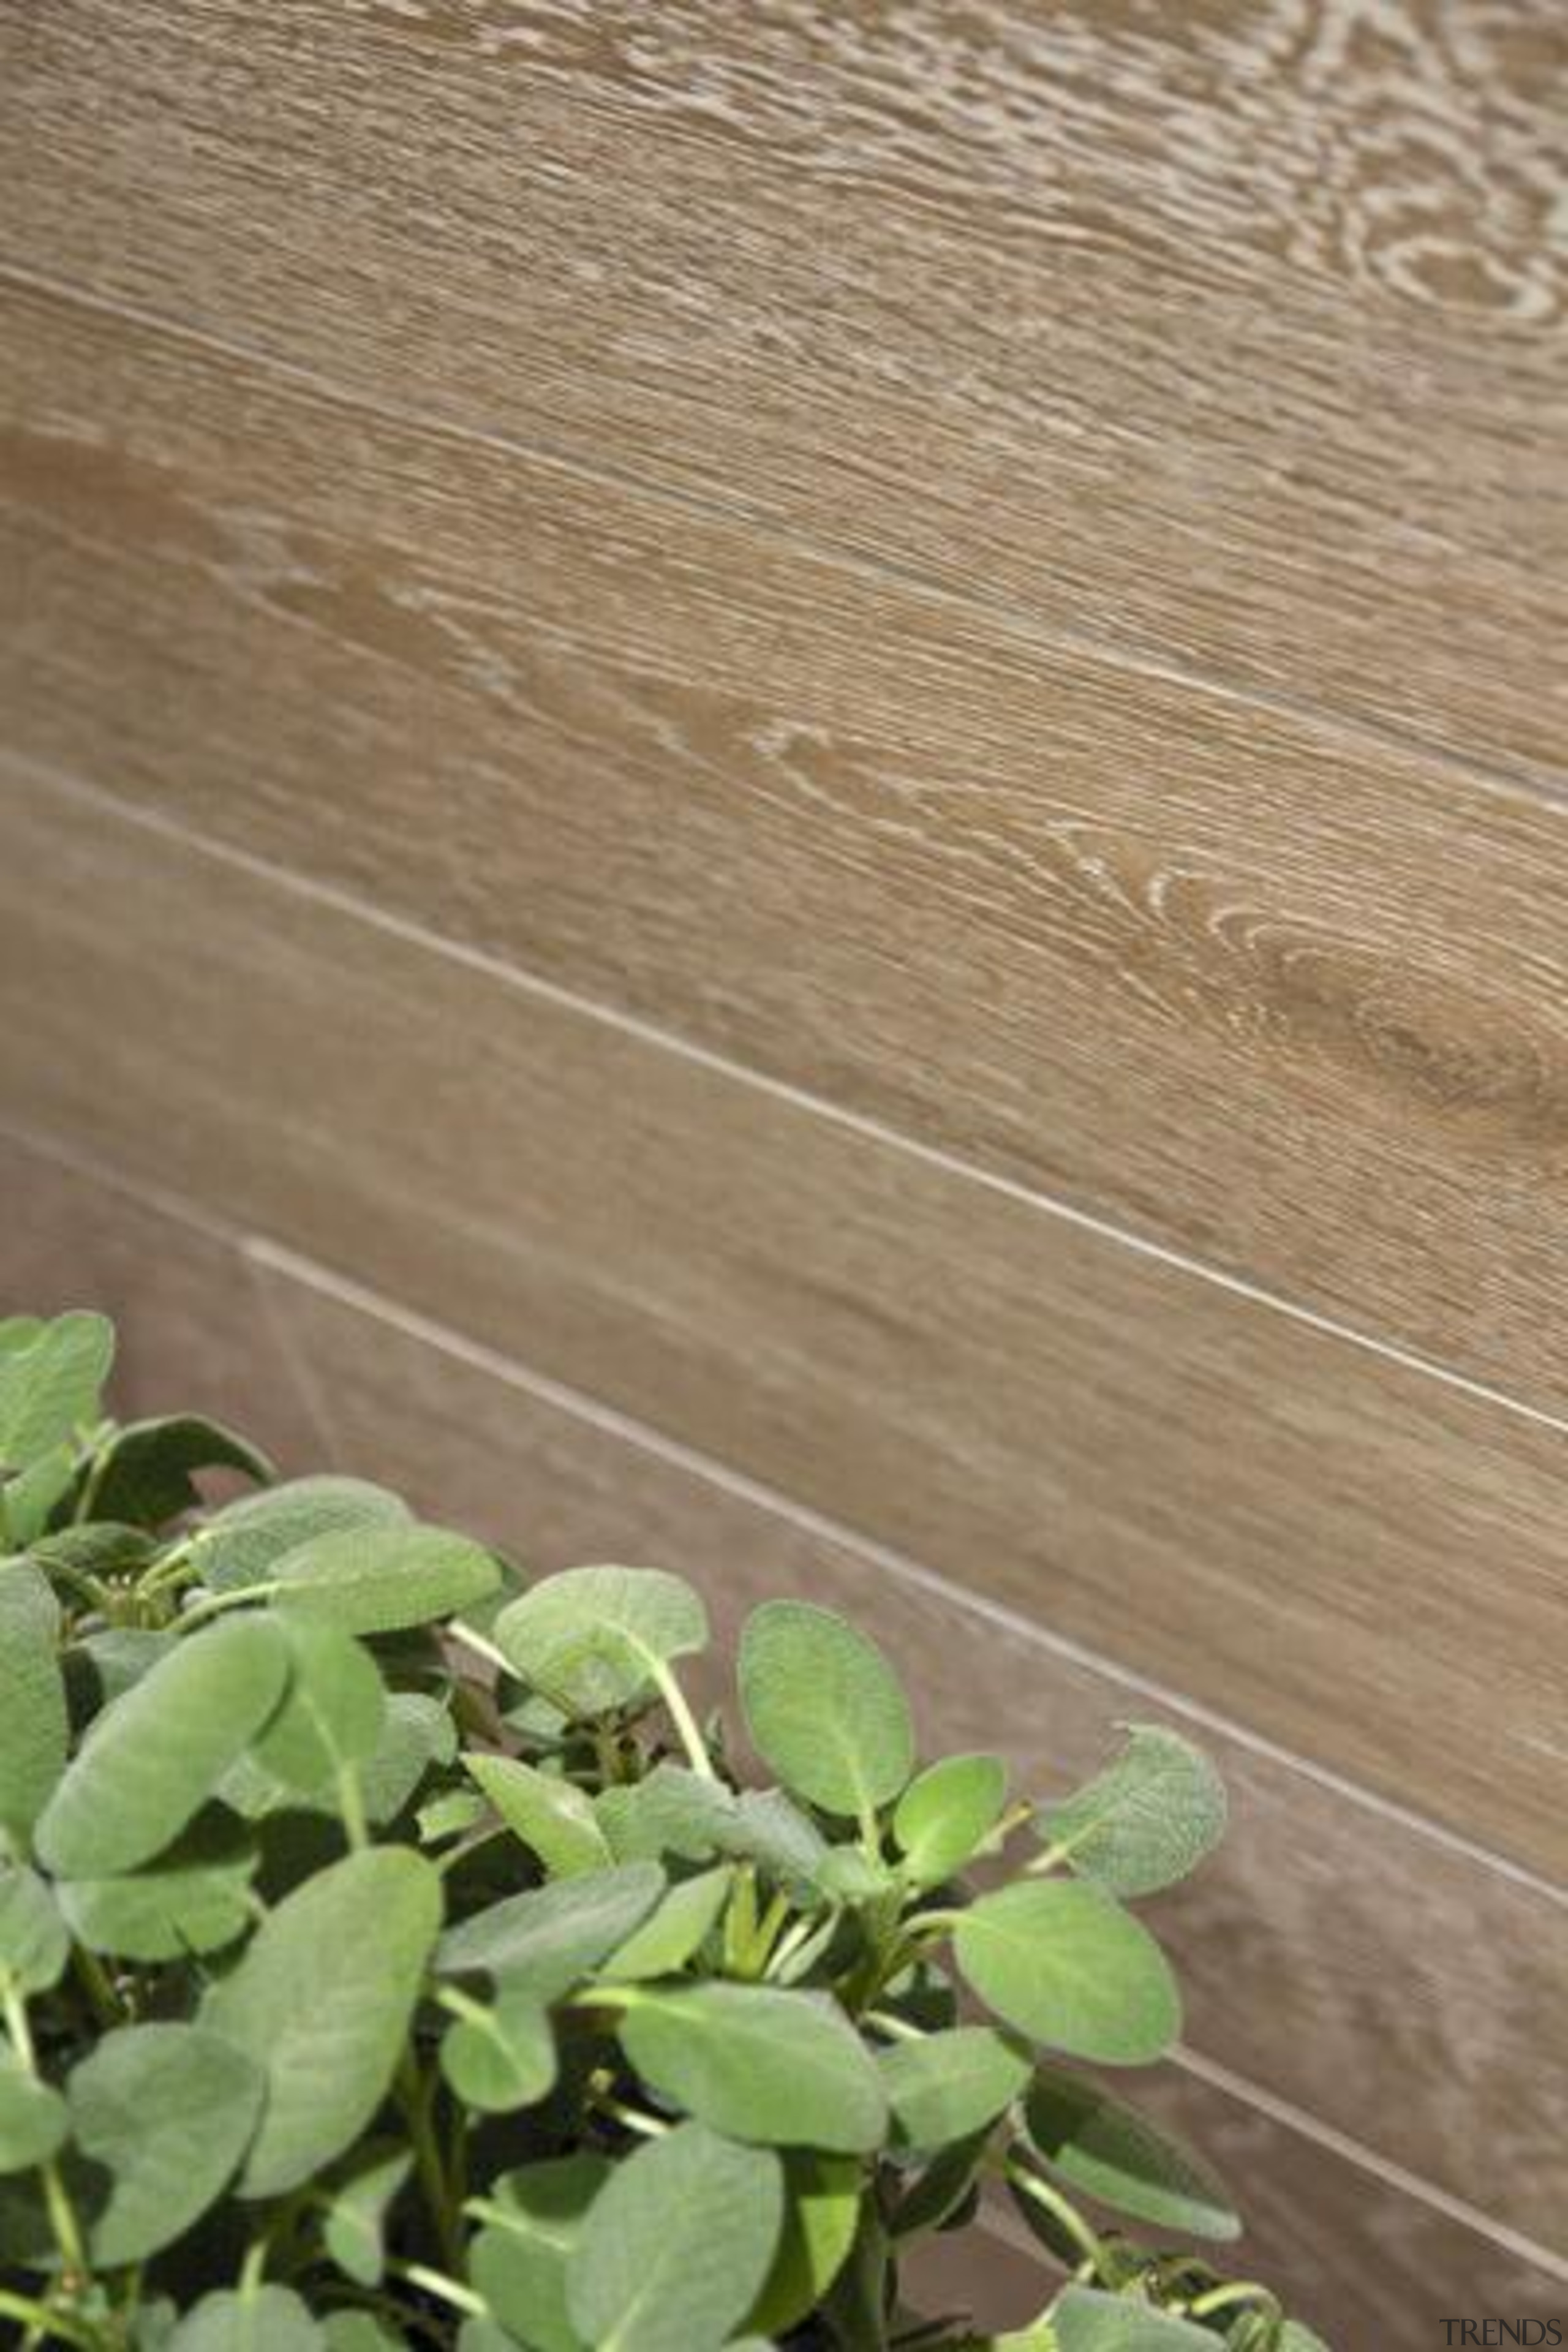 Bioplank noisette interior wall tile. - Bioplank - grass, leaf, plant, wood, brown